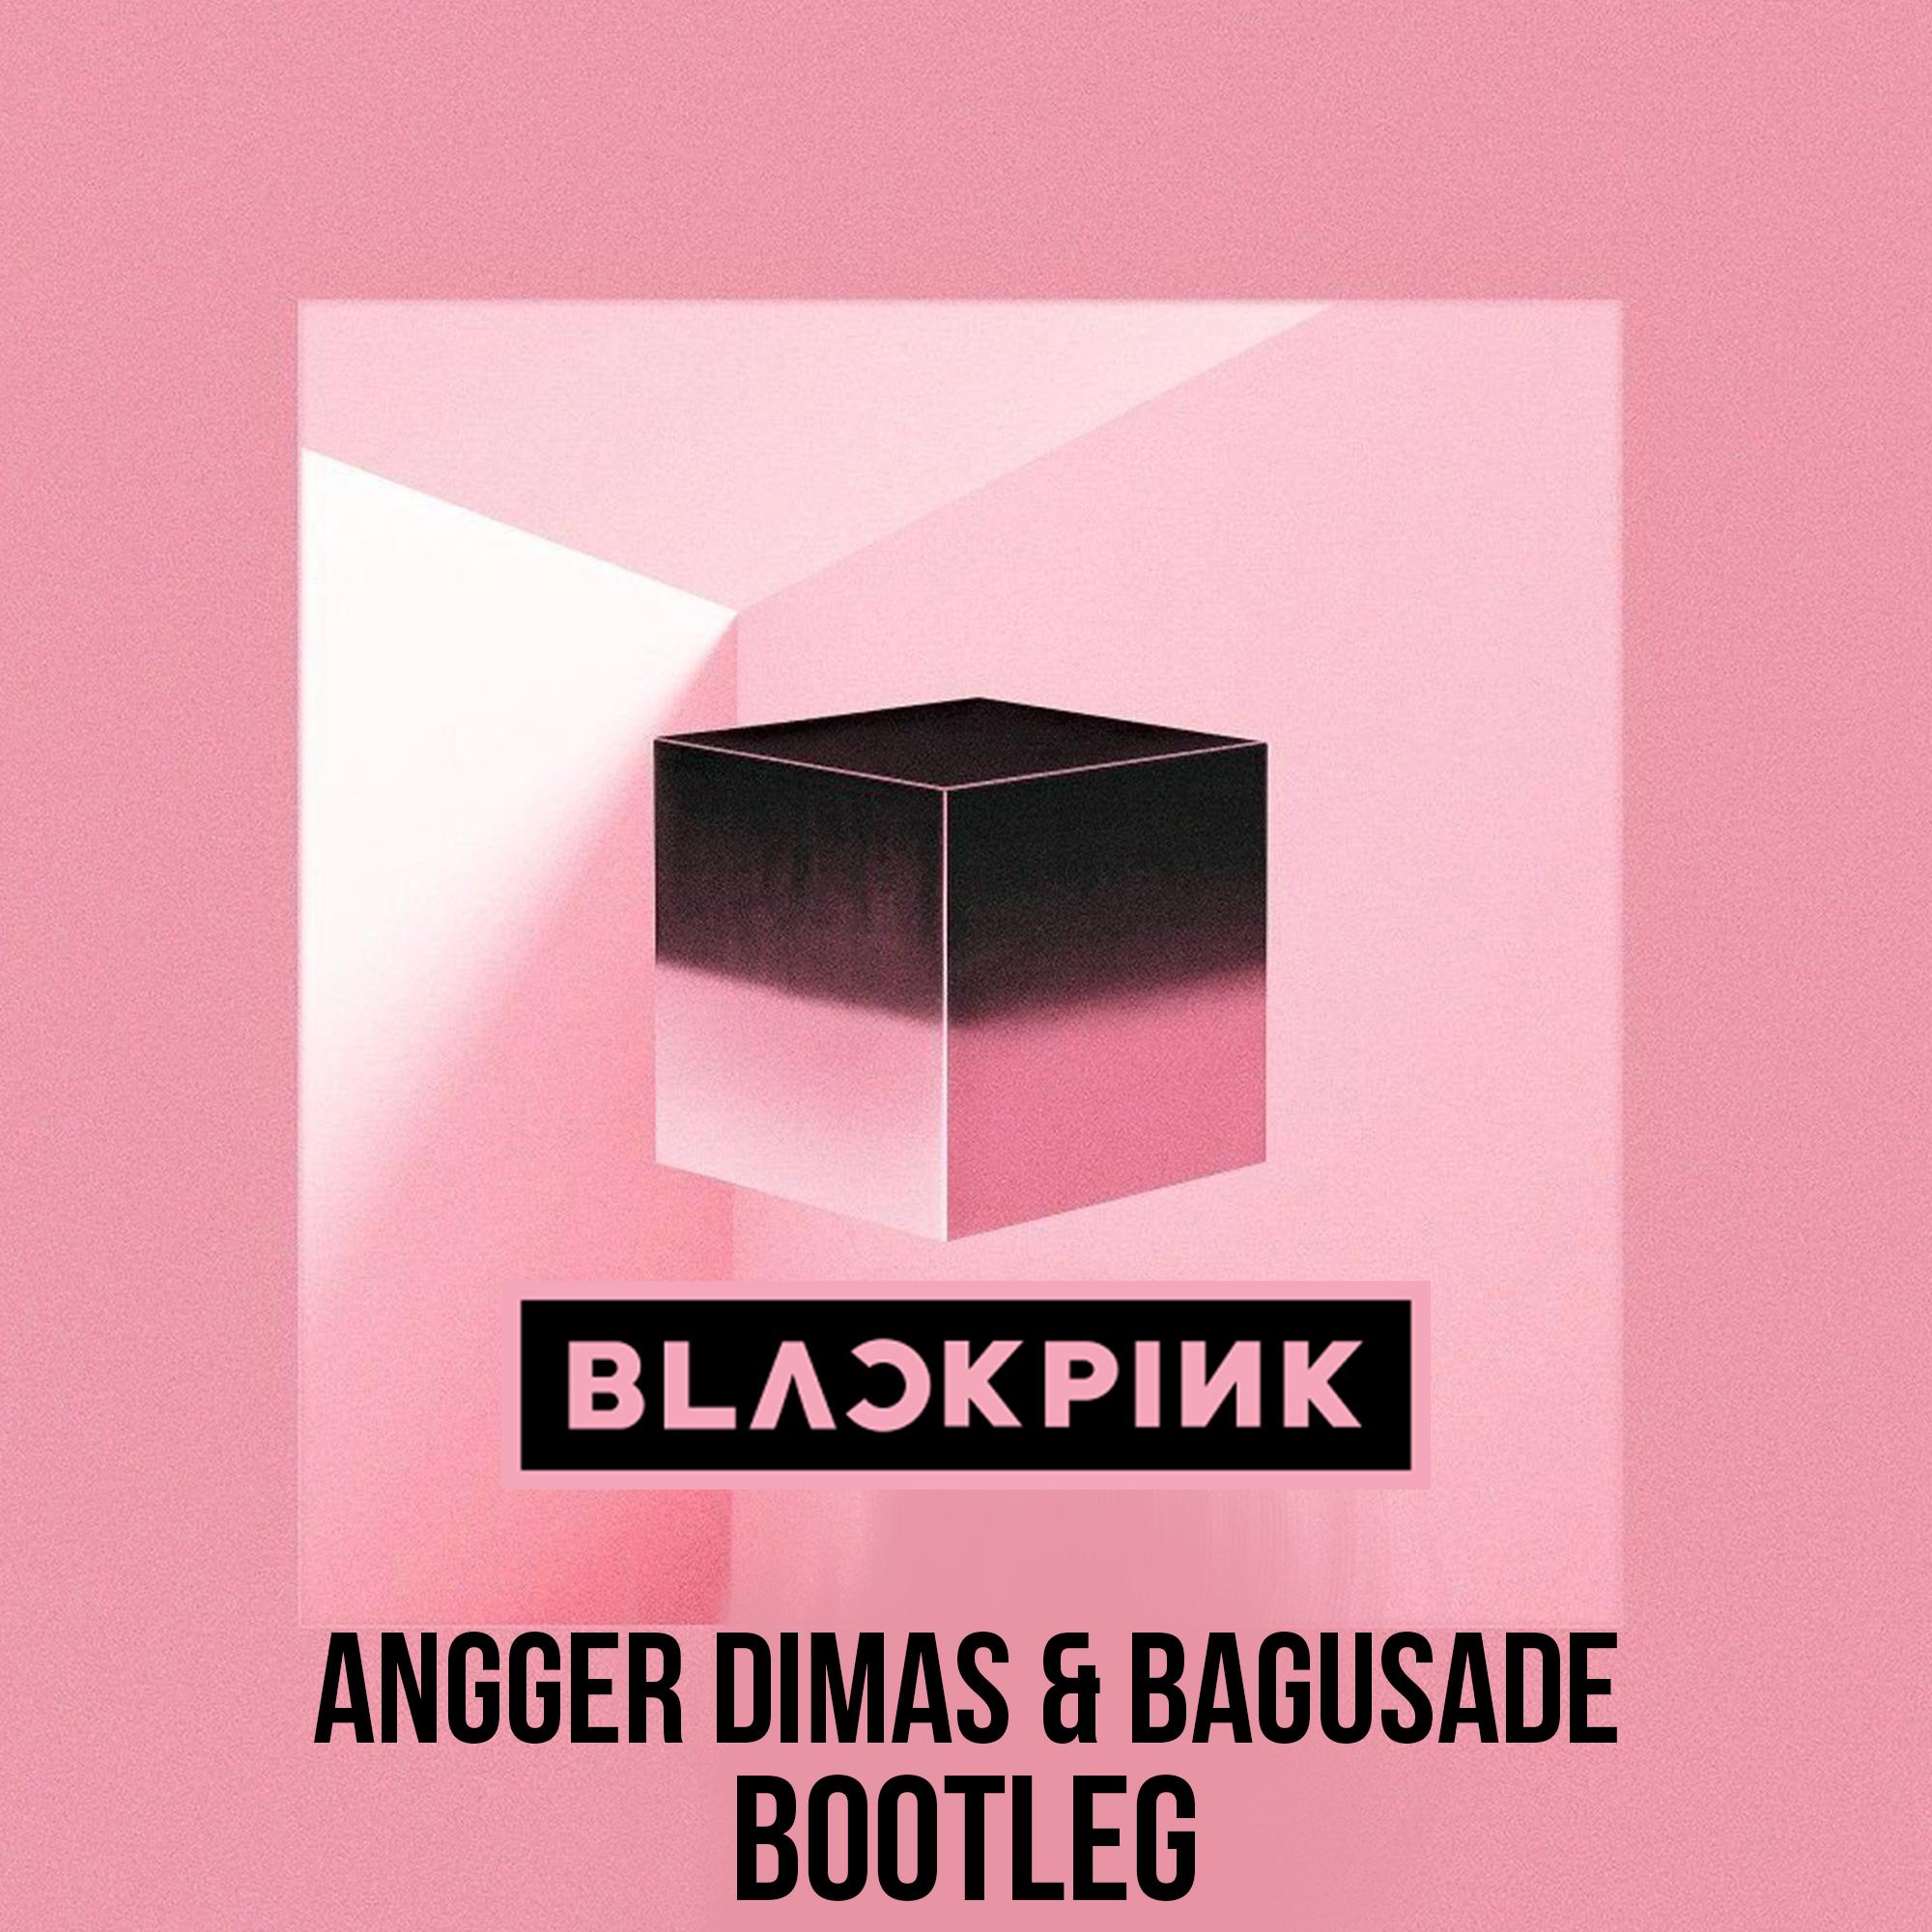 Blackpink - DDU DU DDU DU (Angger Dimas & Bagusade 4AM